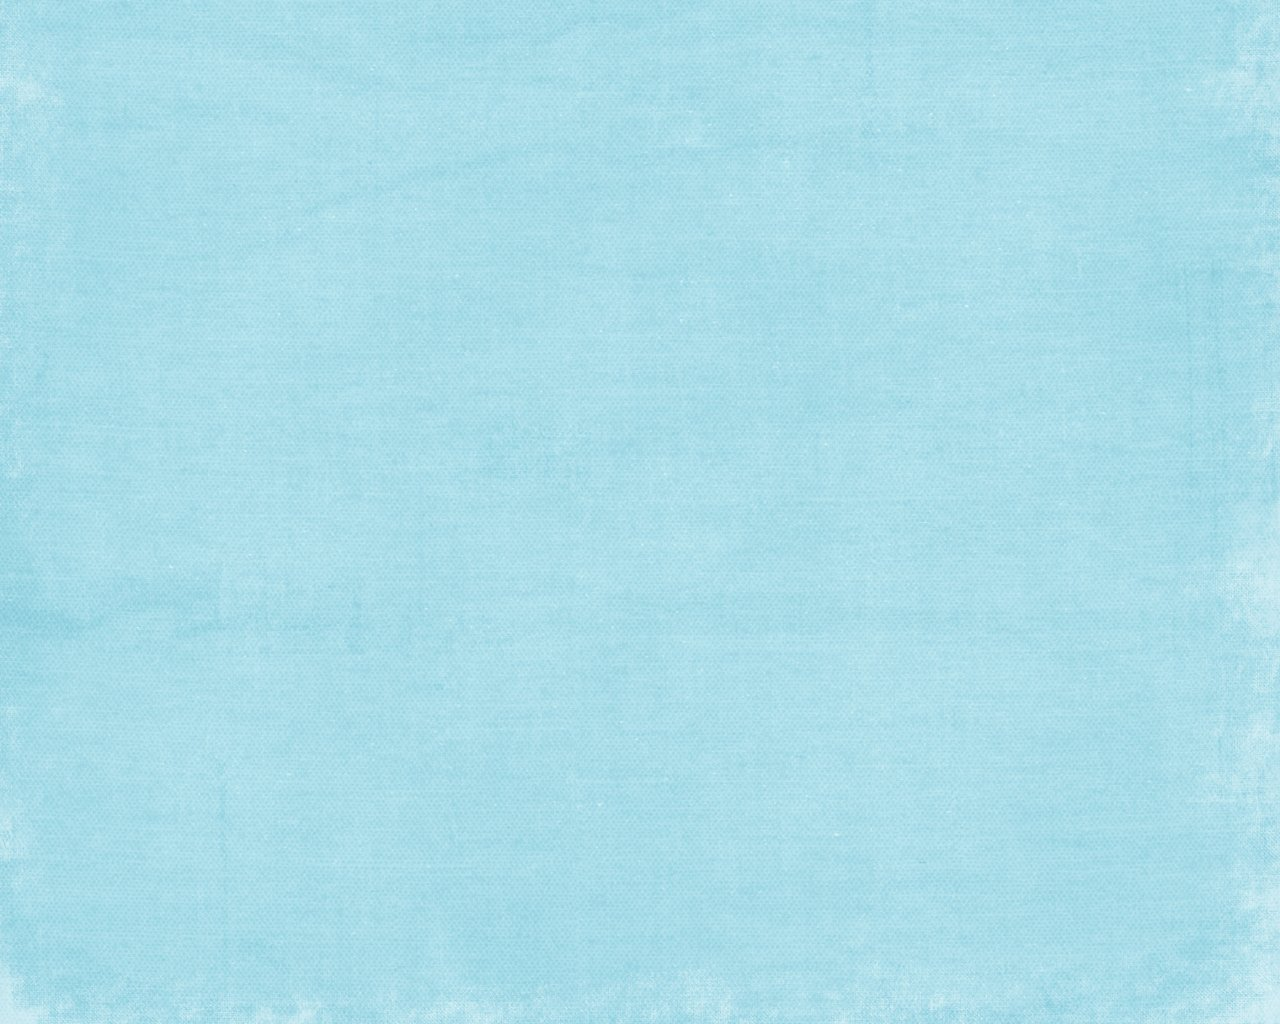 Free Light Blue Backgrounds